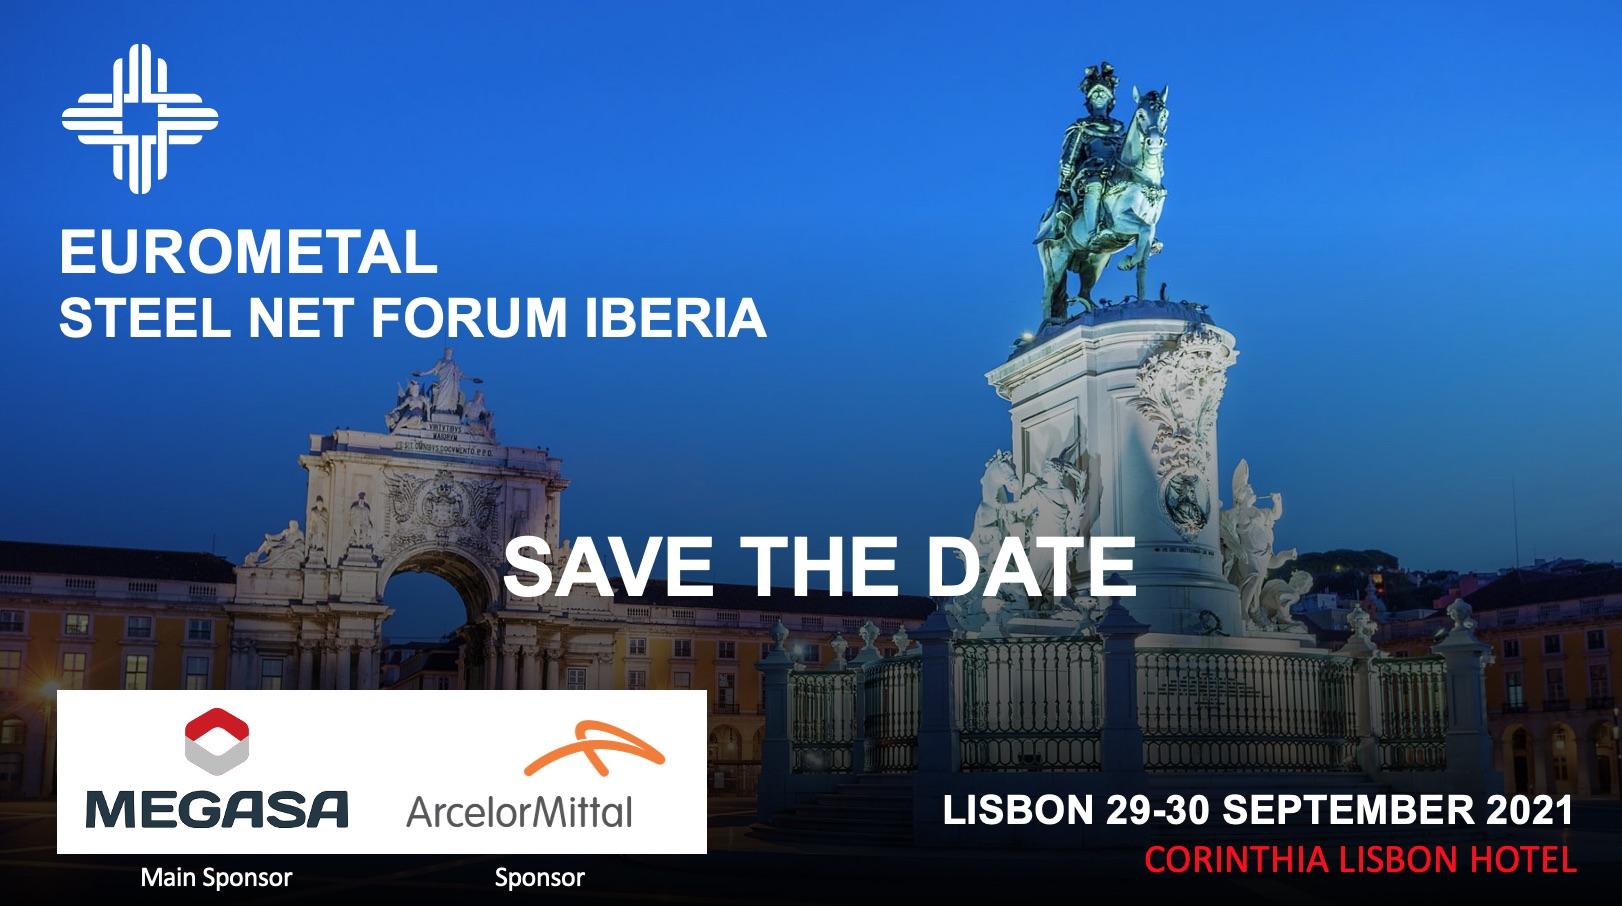 EUROMETAL Steel Net Forum Iberia 2021